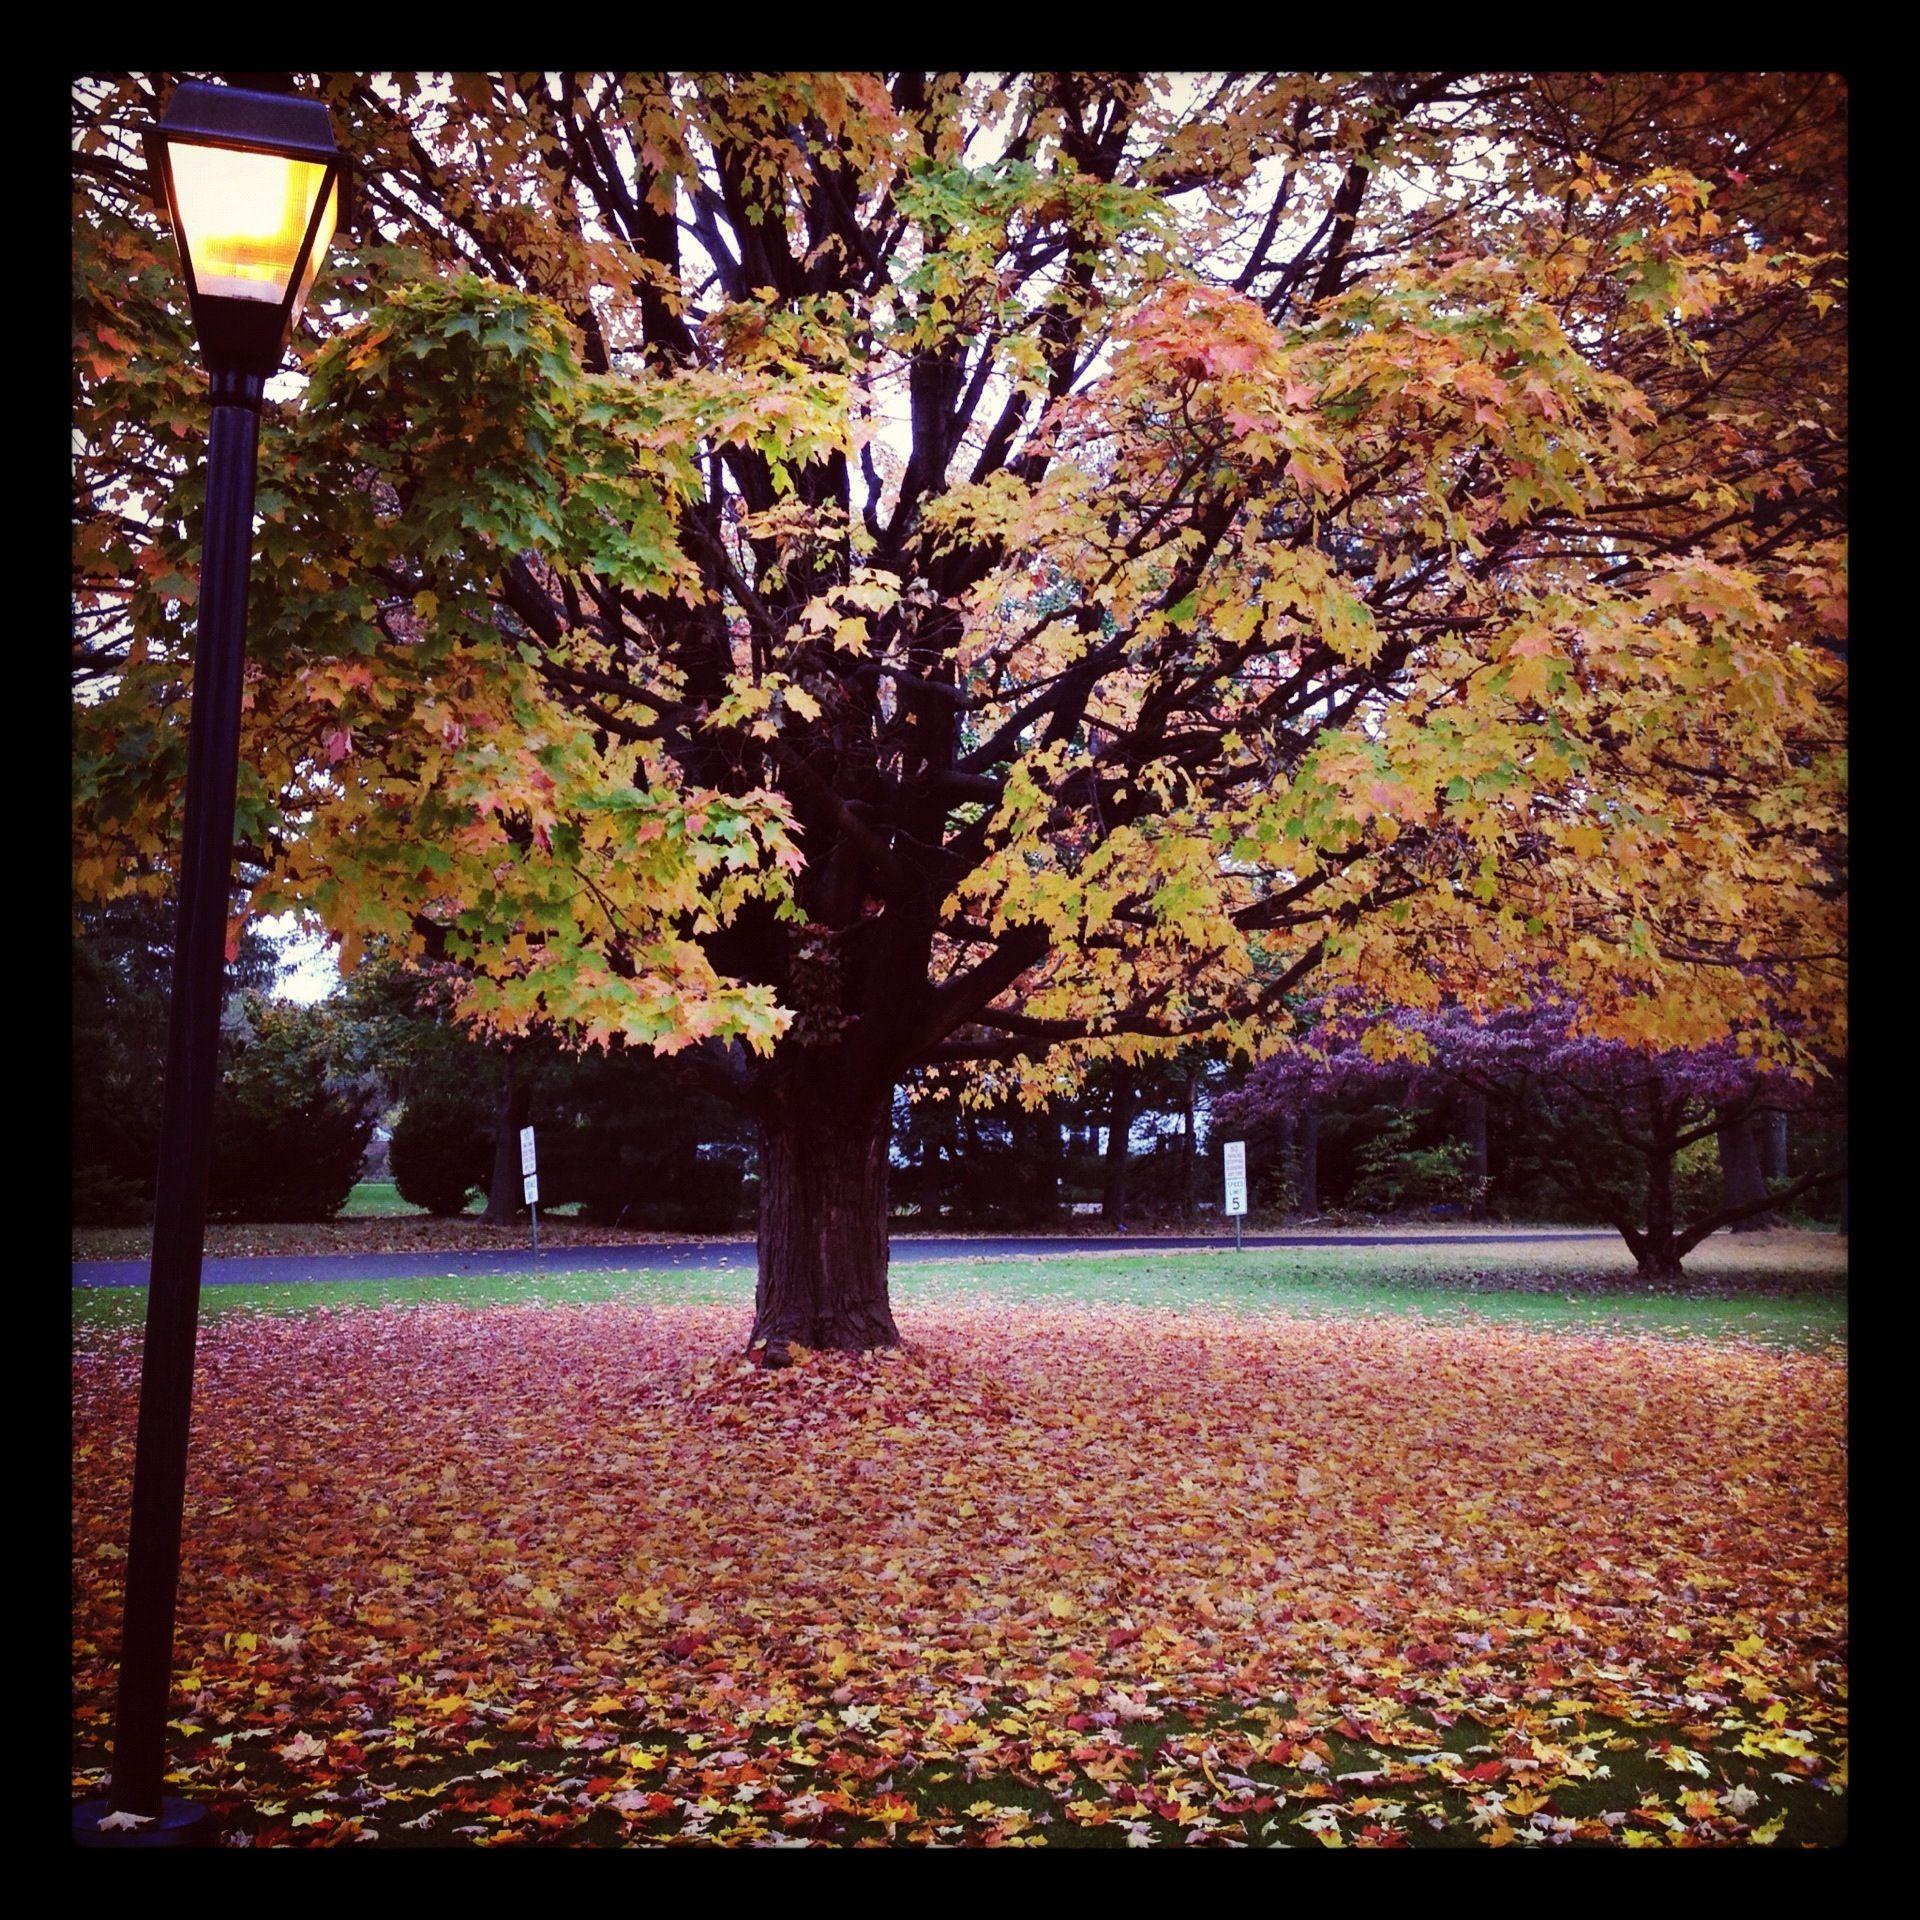 Autumn by amber street light